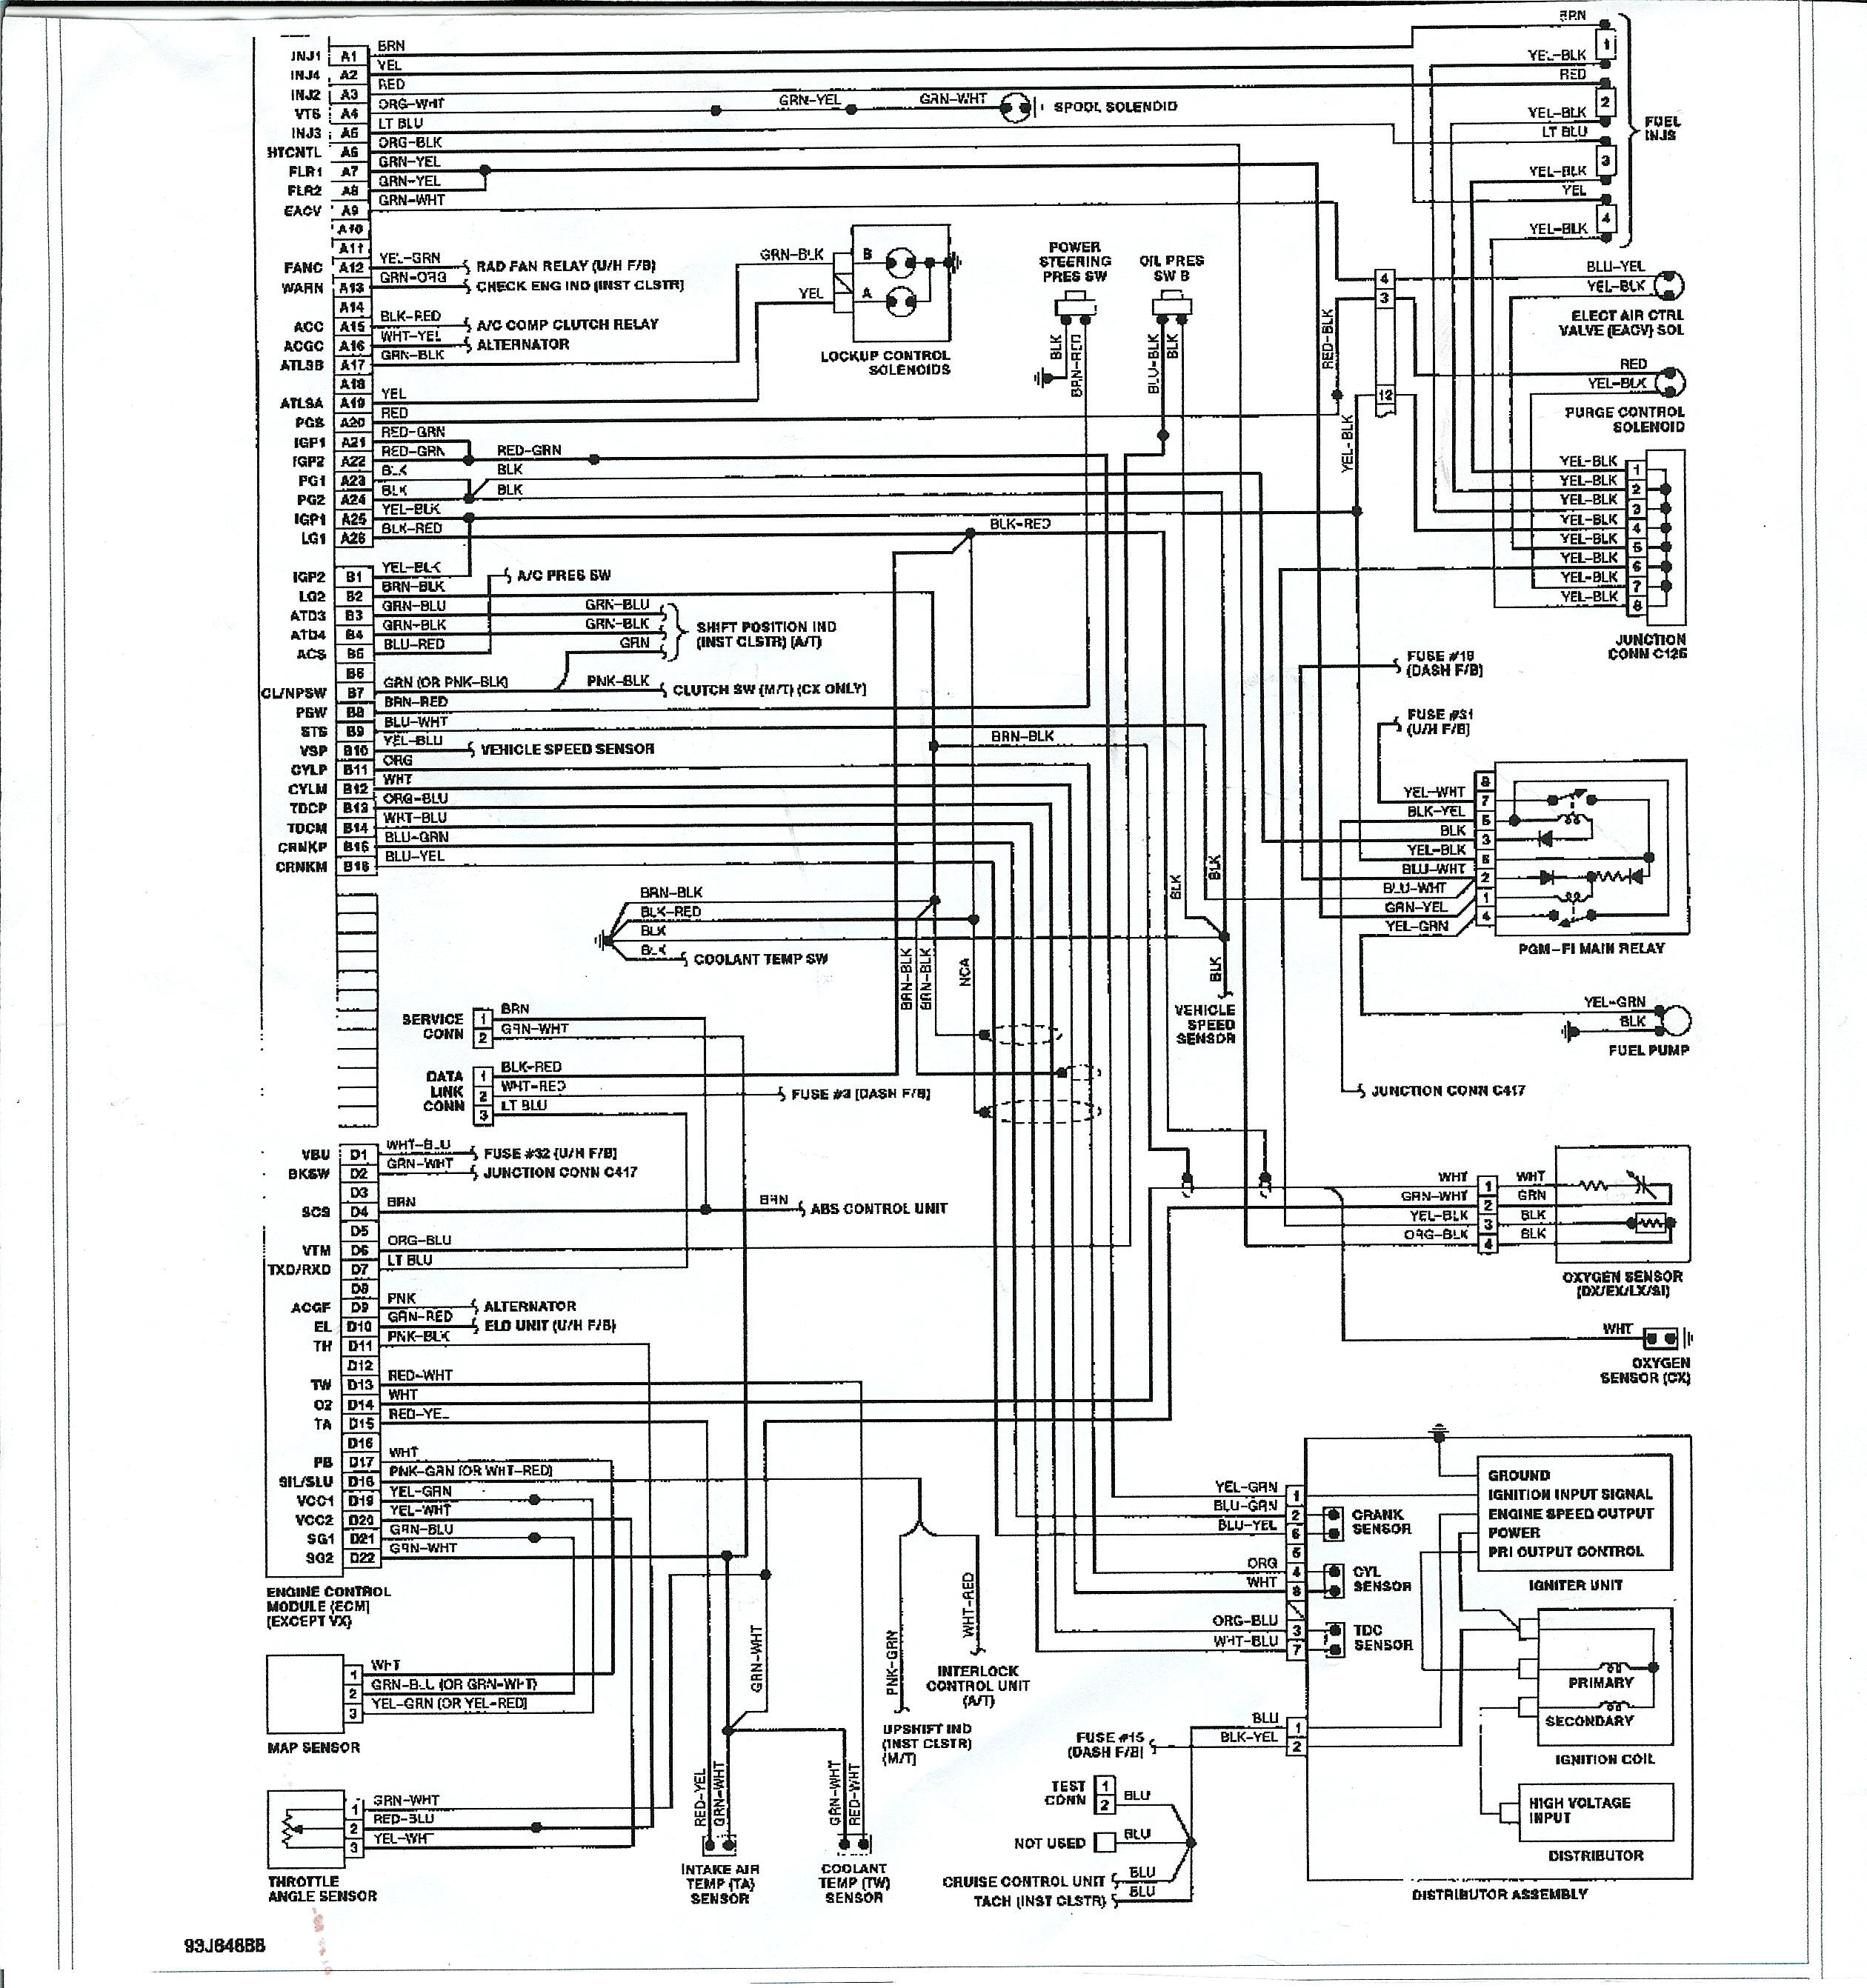 Honda Civic Engine Diagram Vw Transporter Wiring Diagram 95 Honda Civic  Transmission Diagram Of Honda Civic